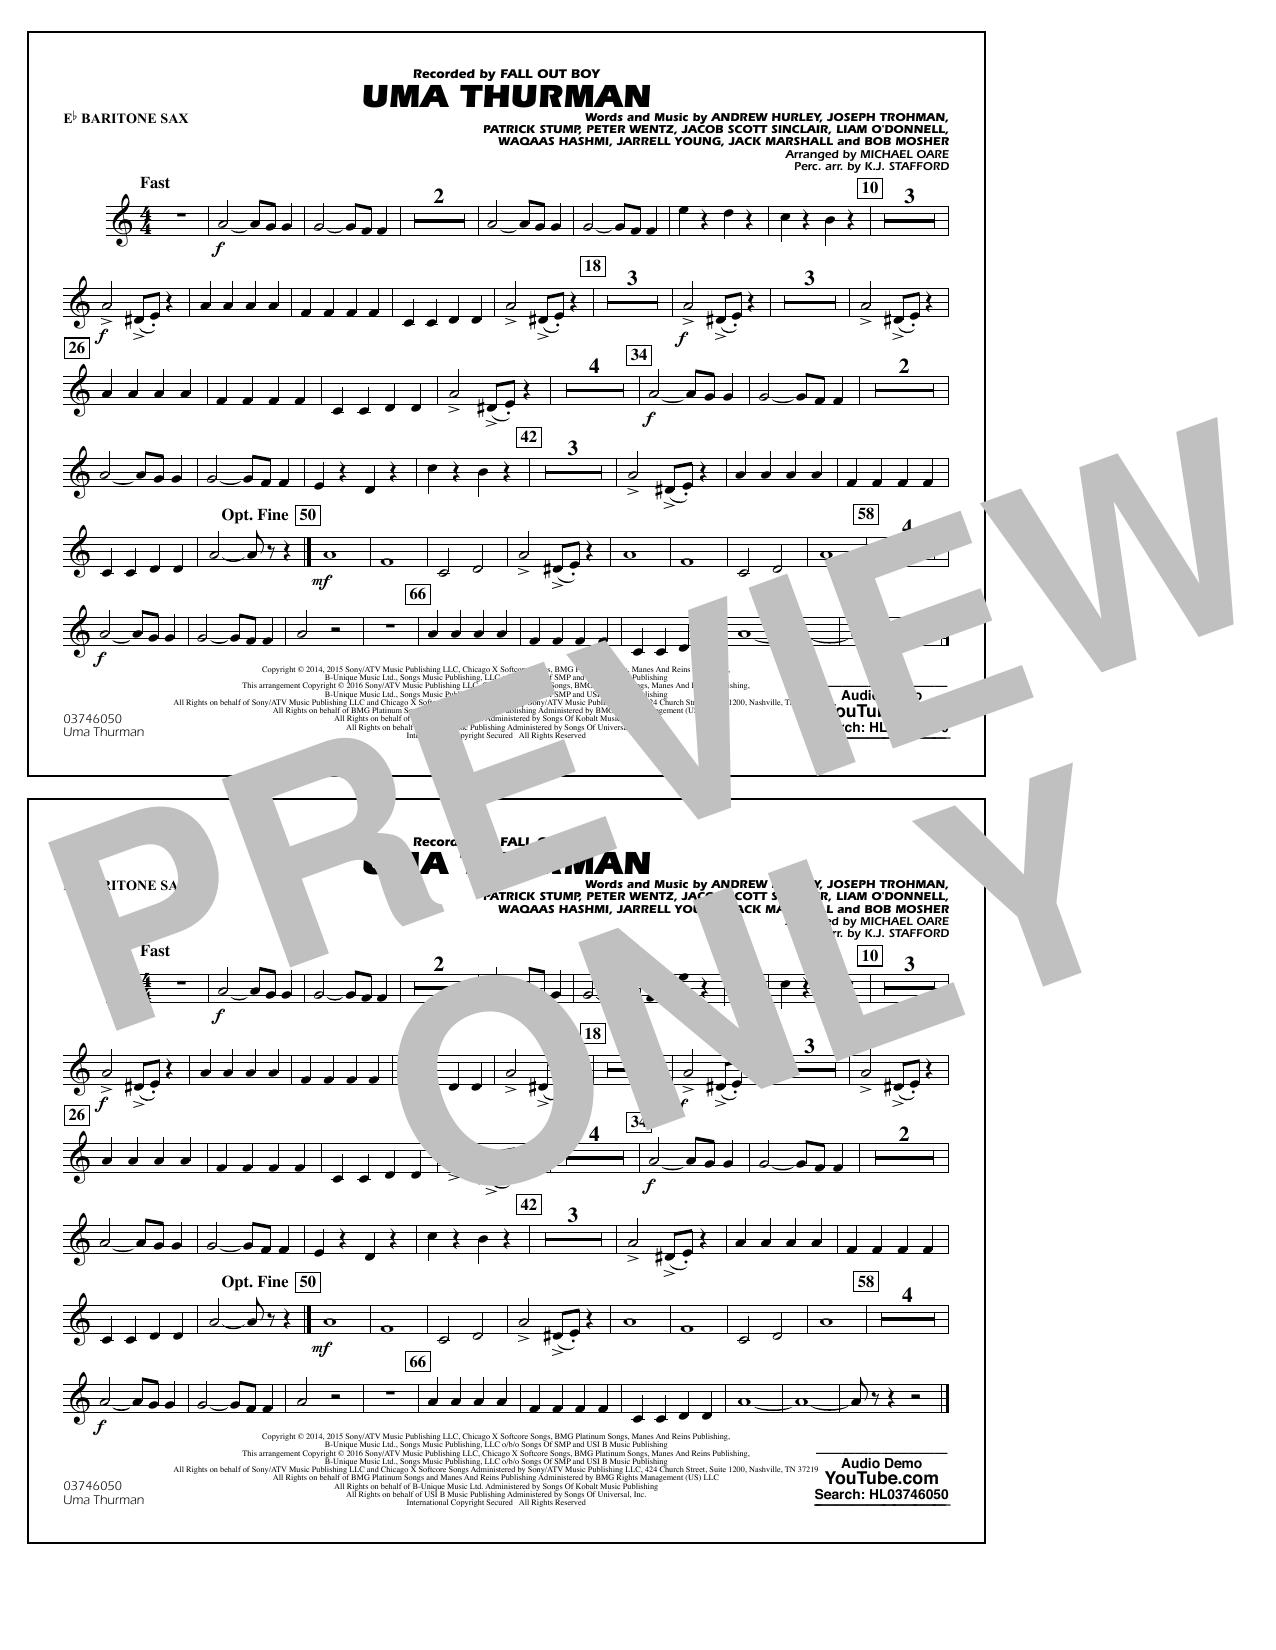 K.J. Stafford - Uma Thurman - Eb Baritone Sax